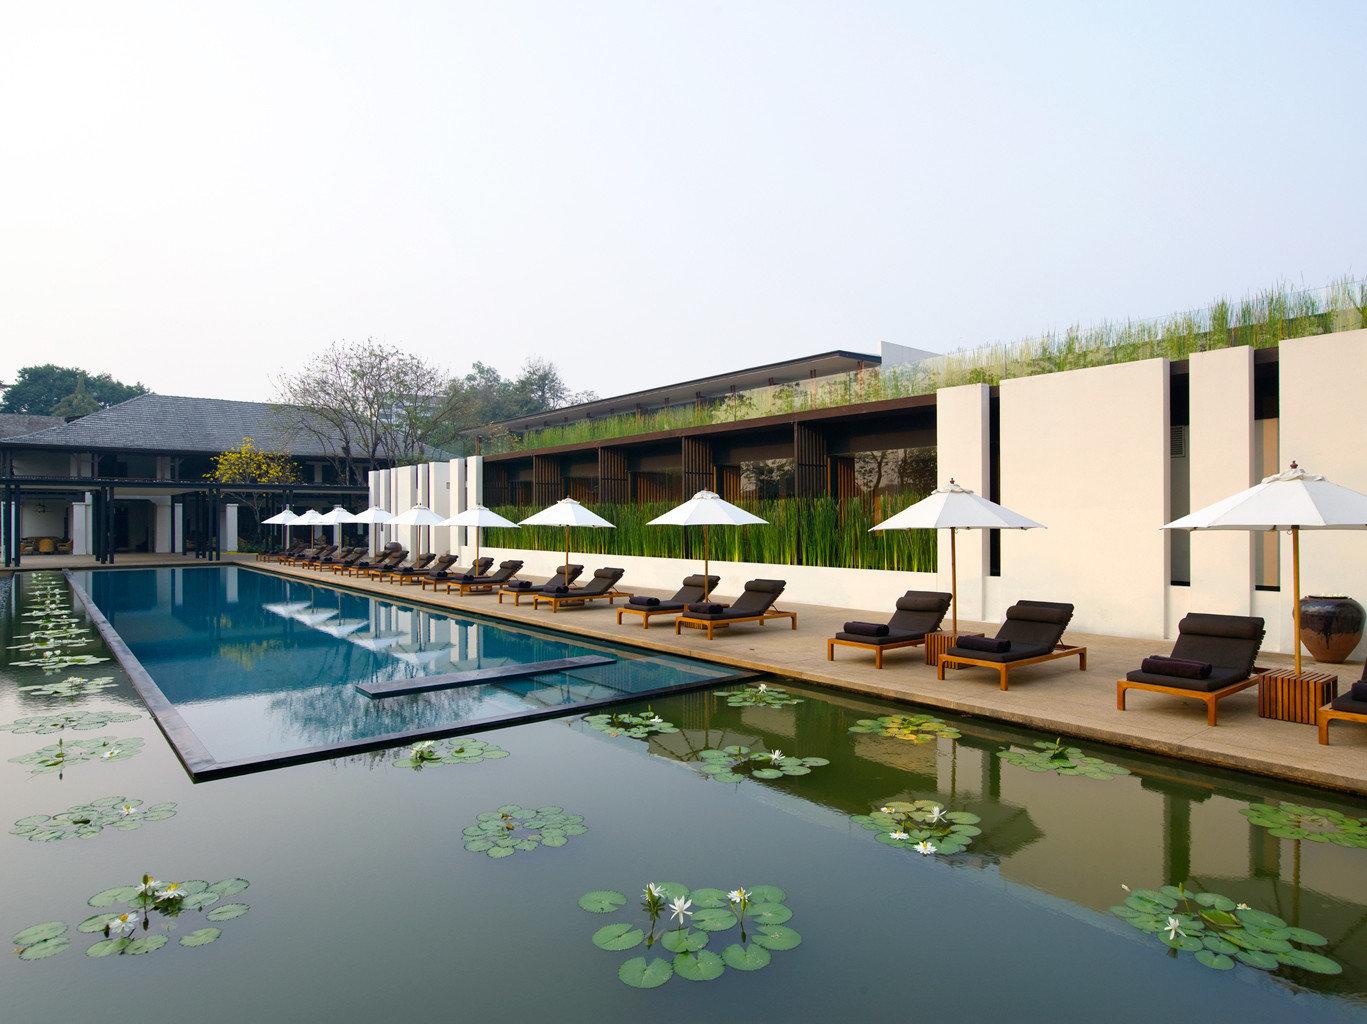 Elegant Hip Hotels Luxury Pool Romance Waterfront sky water swimming pool leisure property outdoor condominium Architecture estate reflecting pool Villa Resort